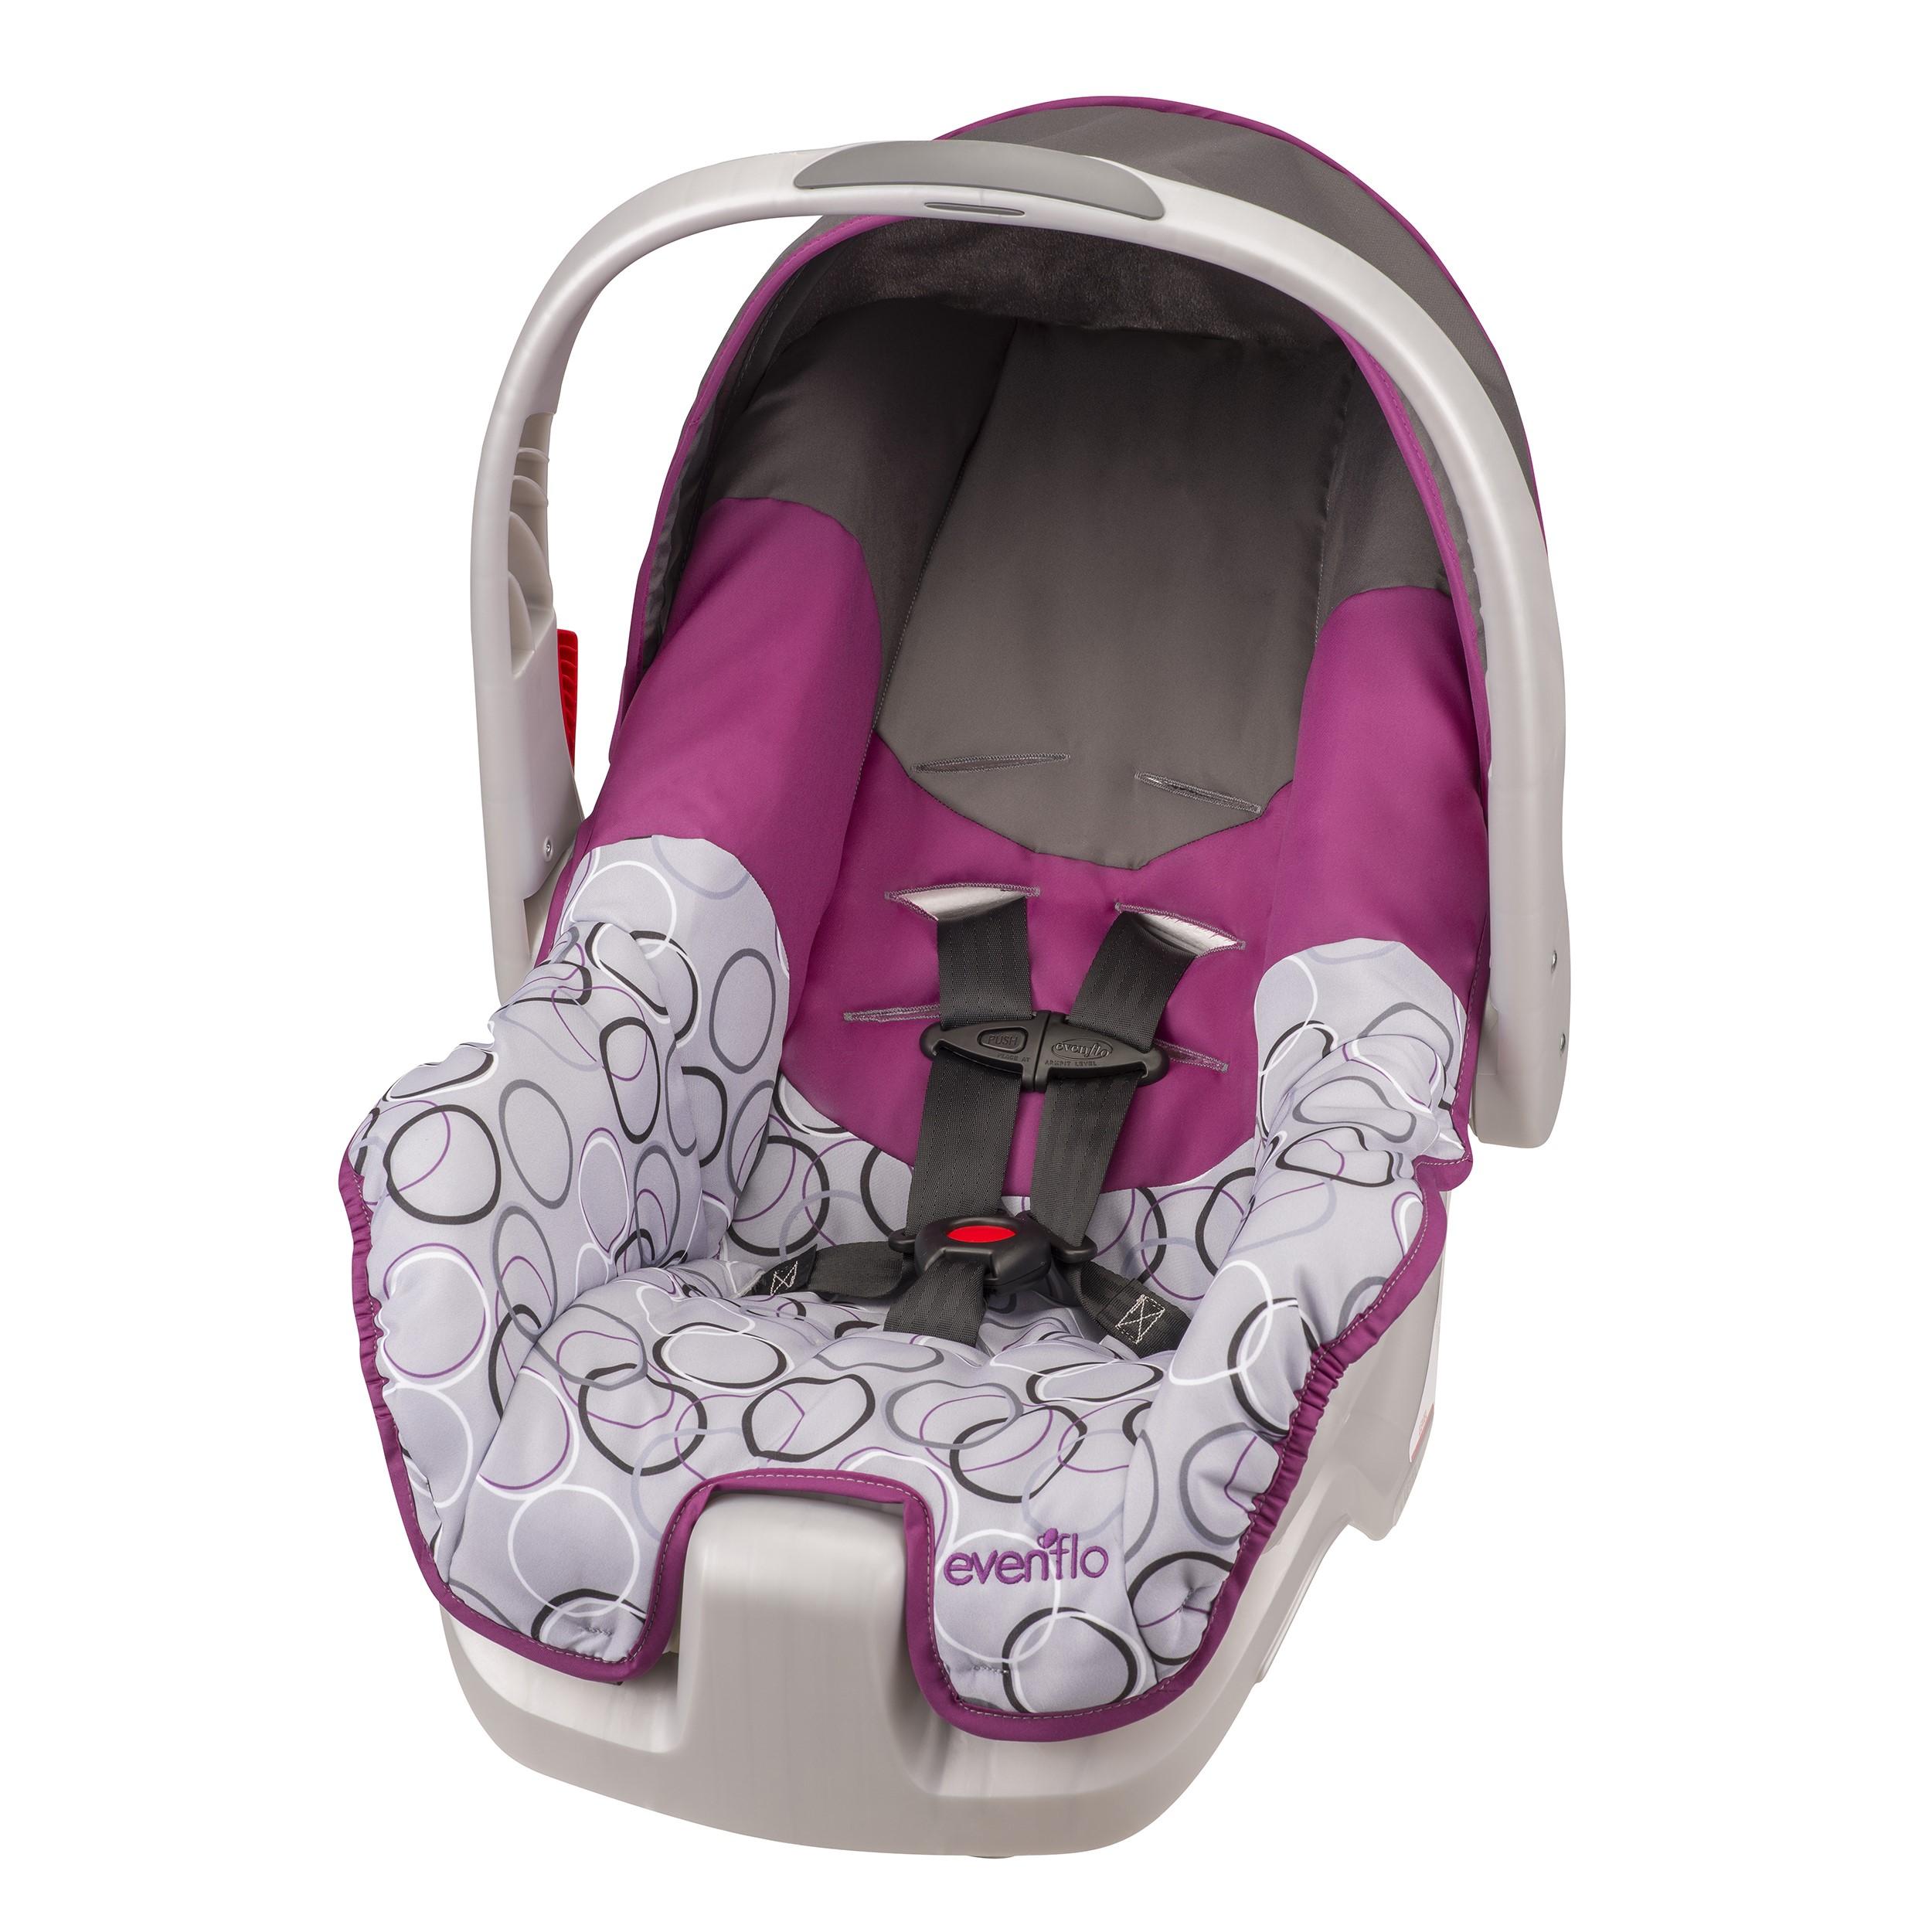 Evenflo Nurture Infant Car Seat, Choose Your Pattern